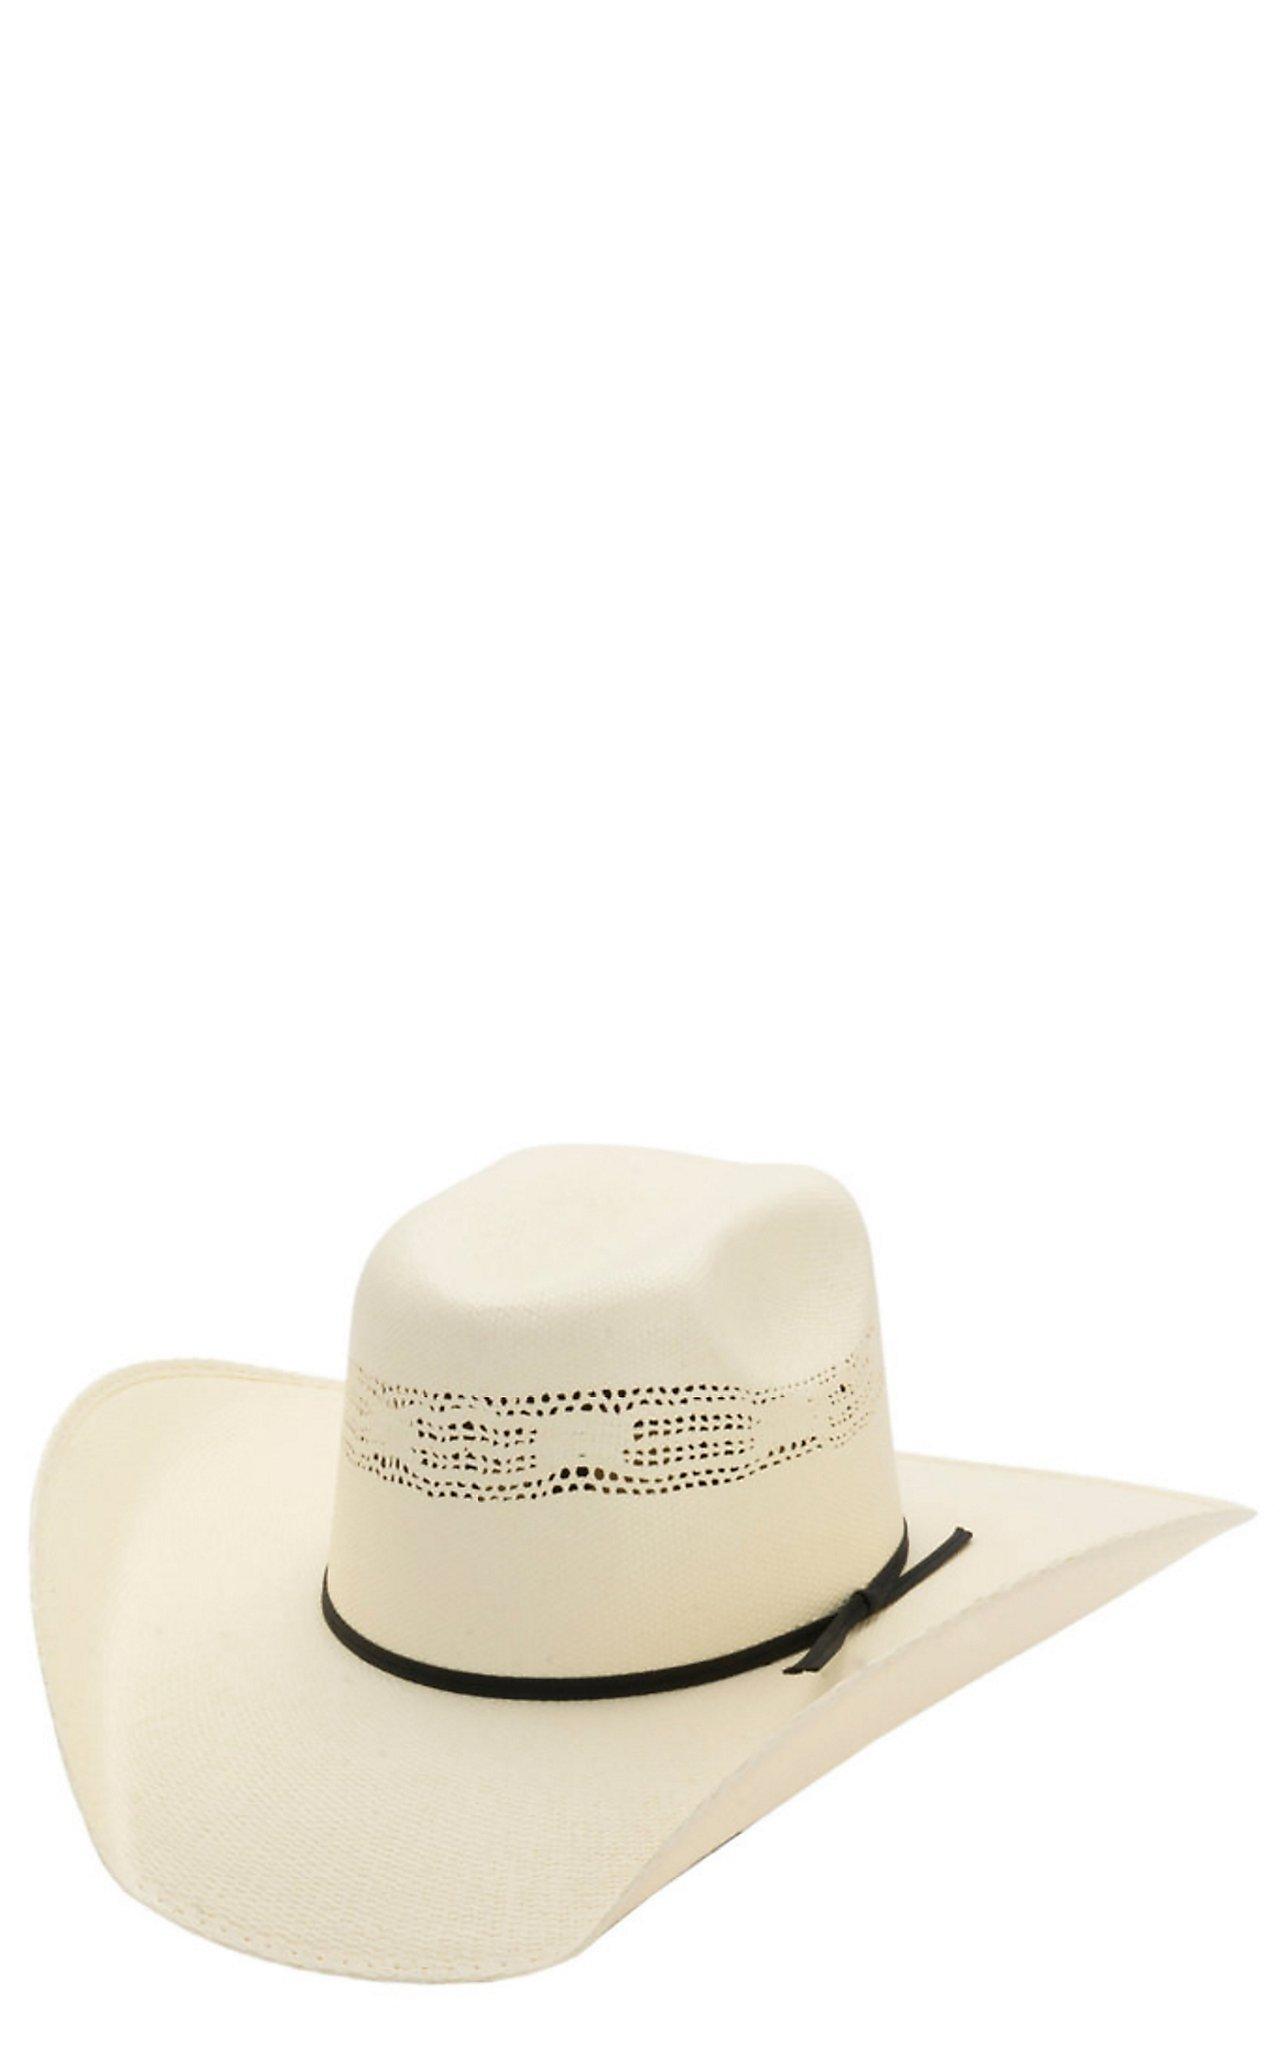 Cavenders 10X Natural Bangora Vented Crown Straw Cowboy Hat 27BREP425 d33926213d38